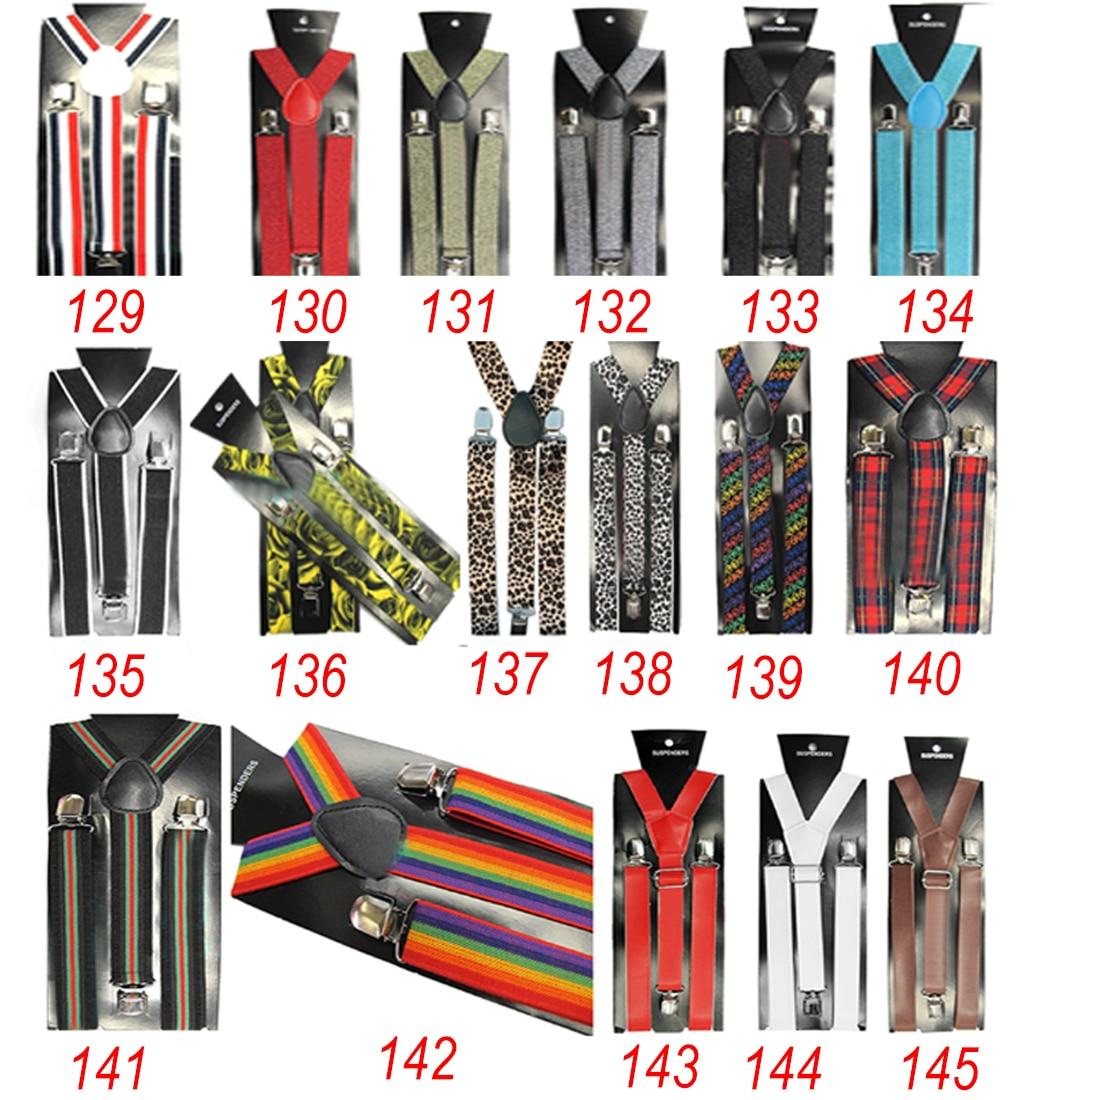 Mens Womens Unisex Clip-on Suspenders Elastic Y-Shape Adjustable 2.5cm*100cm Strap Dress Accessories Strap Apparel Hot 2018 New